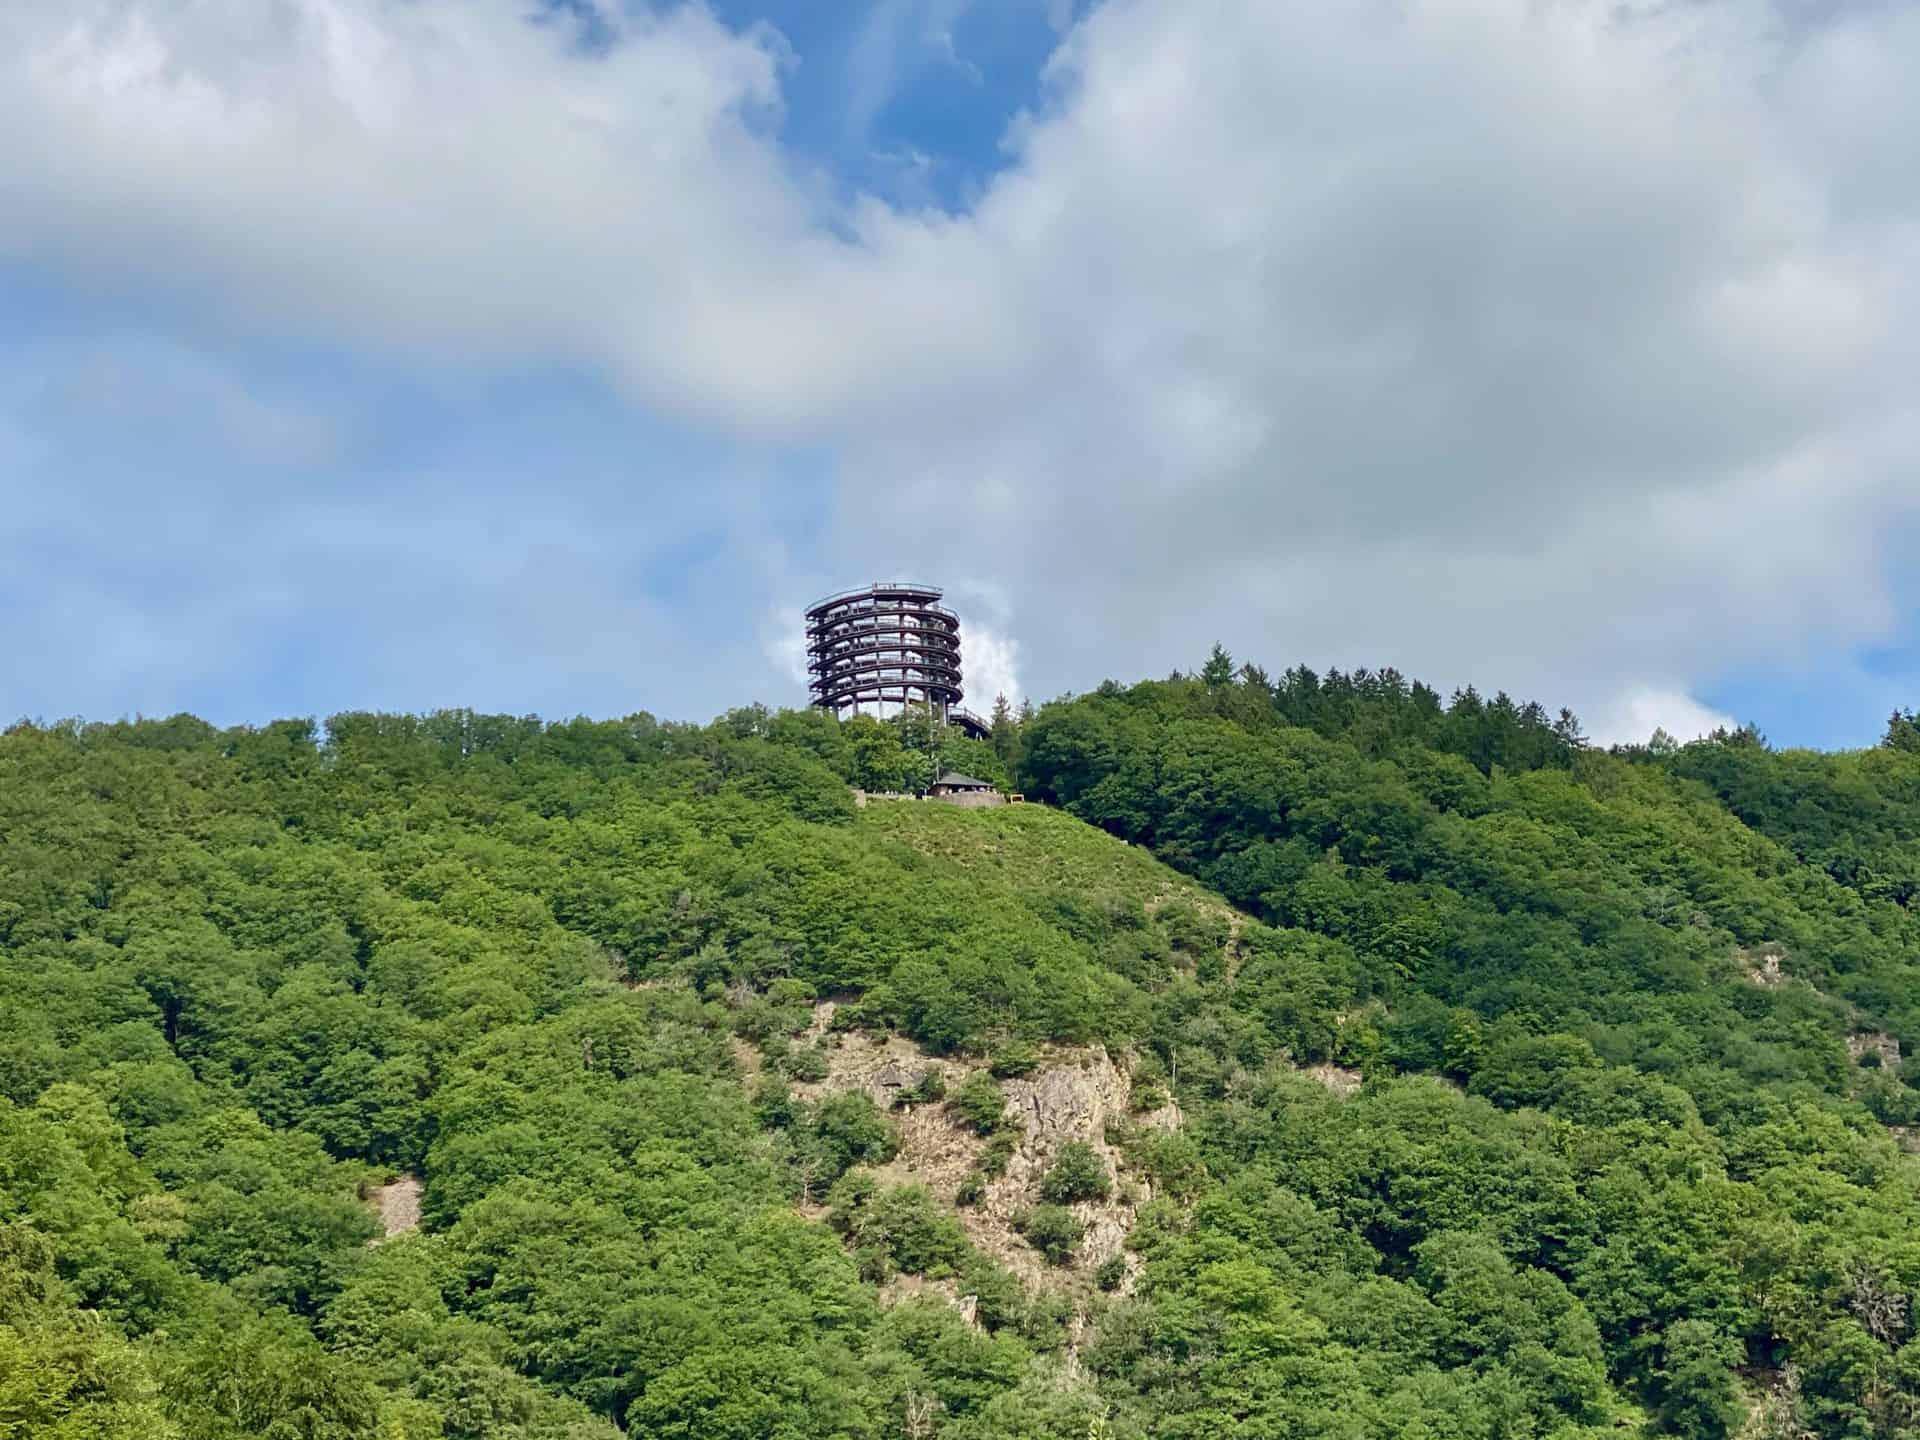 Naturpark-Saar-Hunsrück-Saarschleife-Baumwipfelpfad